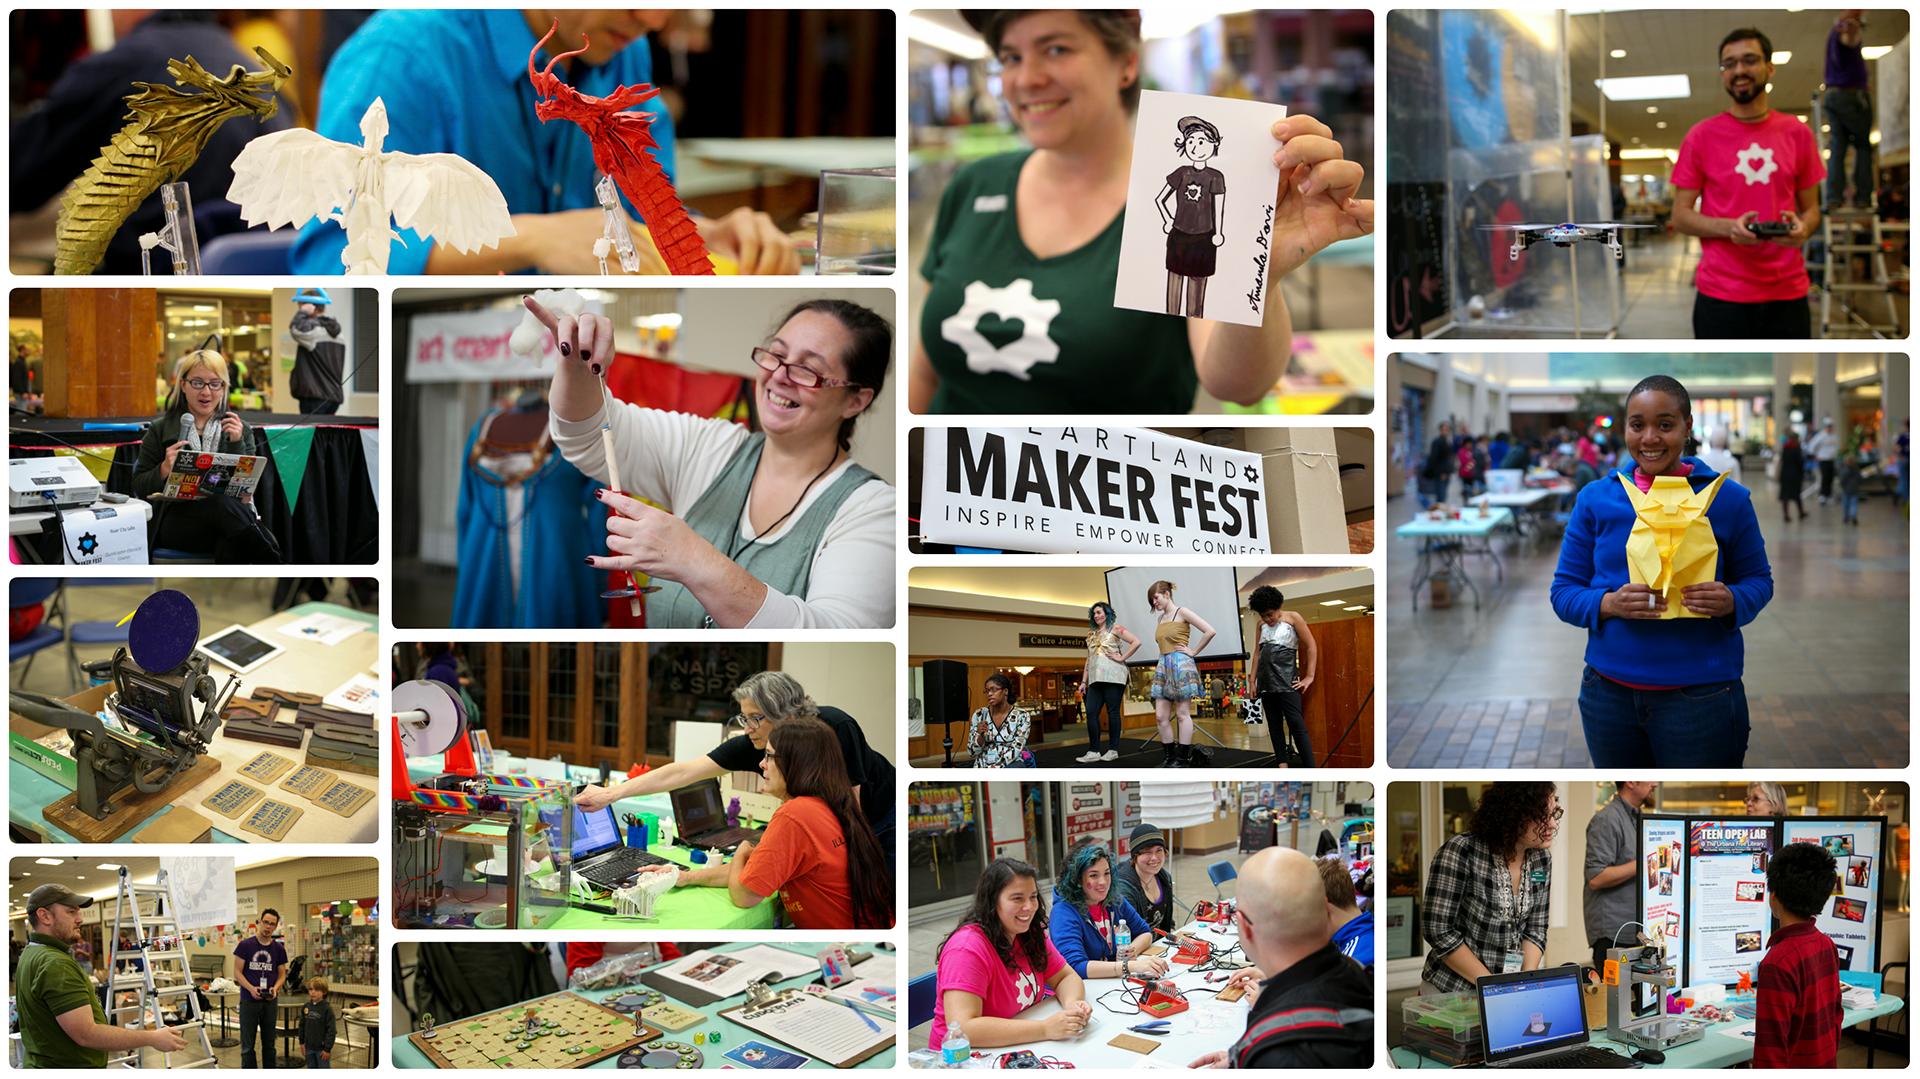 PhotoGrid2015_2_Makerfest1920